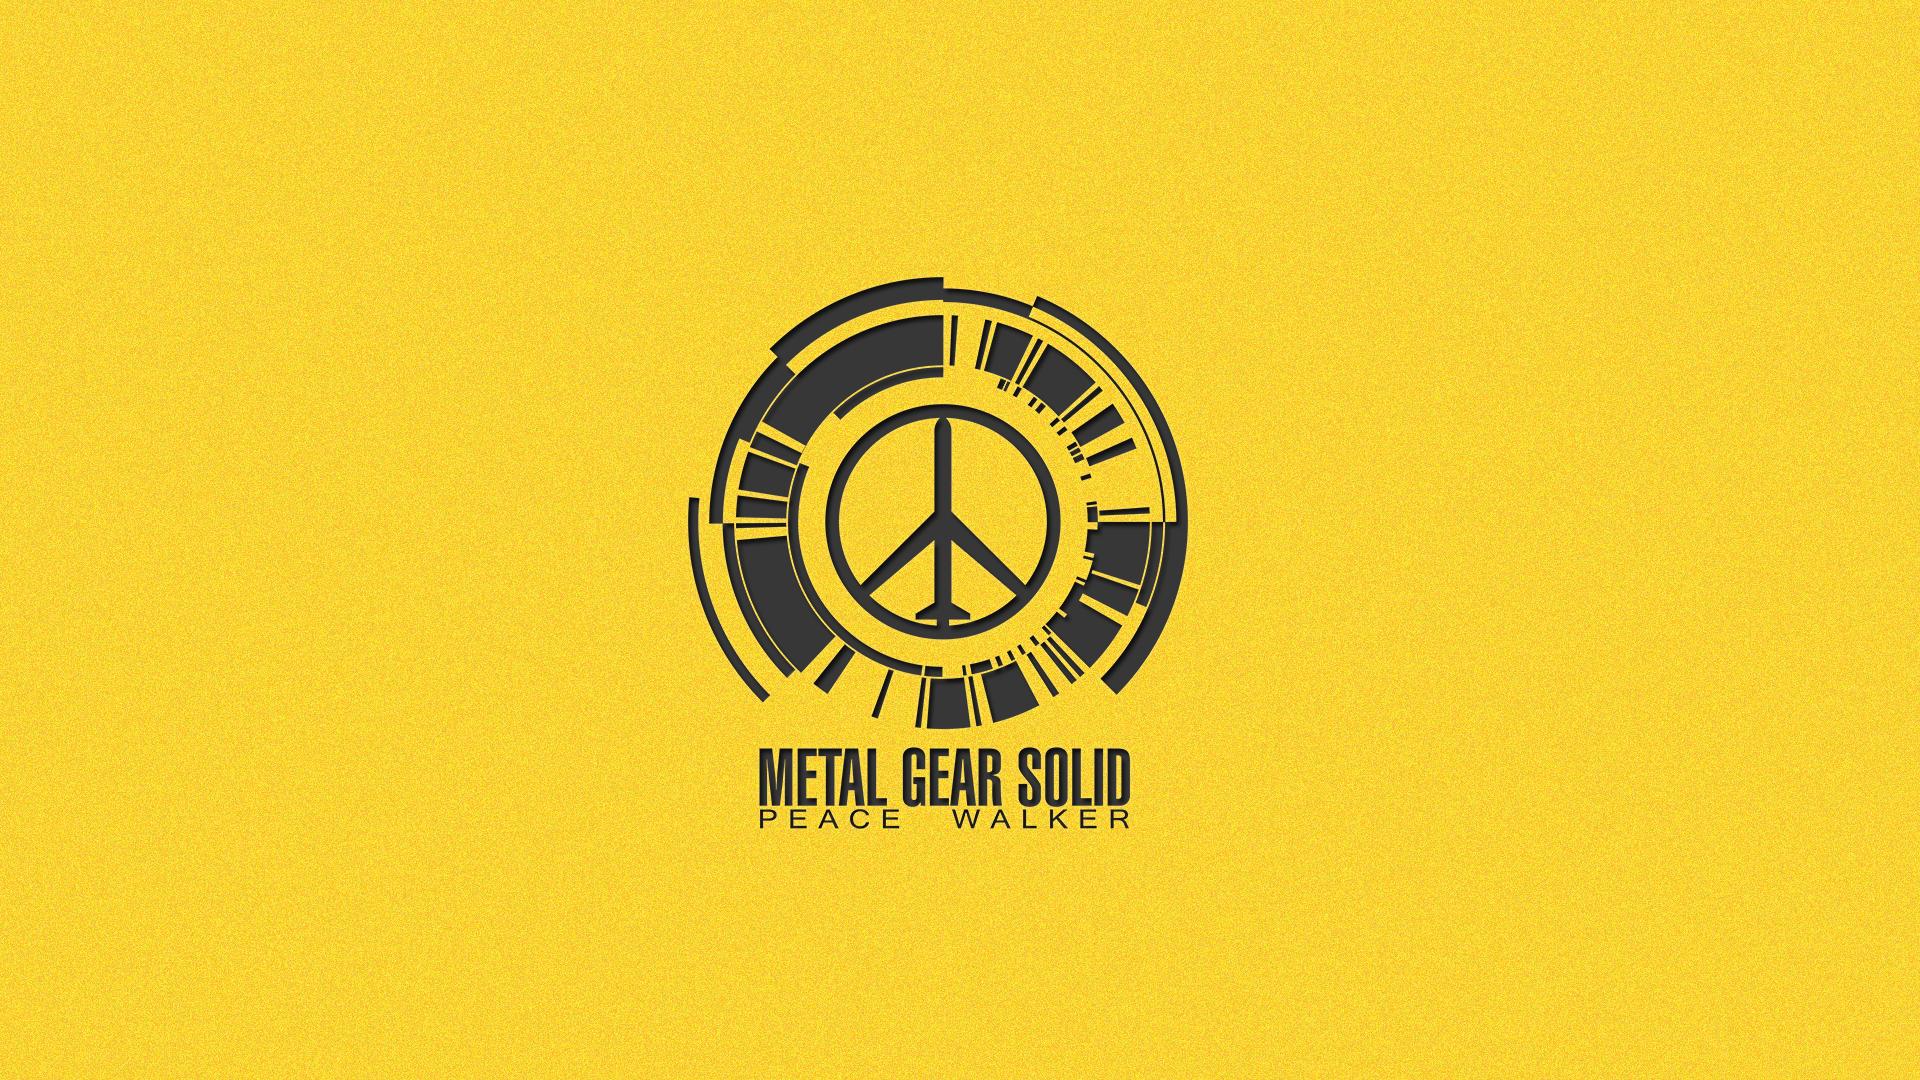 Mgs Peace Walker Logo Yellow By Zero O92 Customization Wallpaper Hdtv 1920x1080